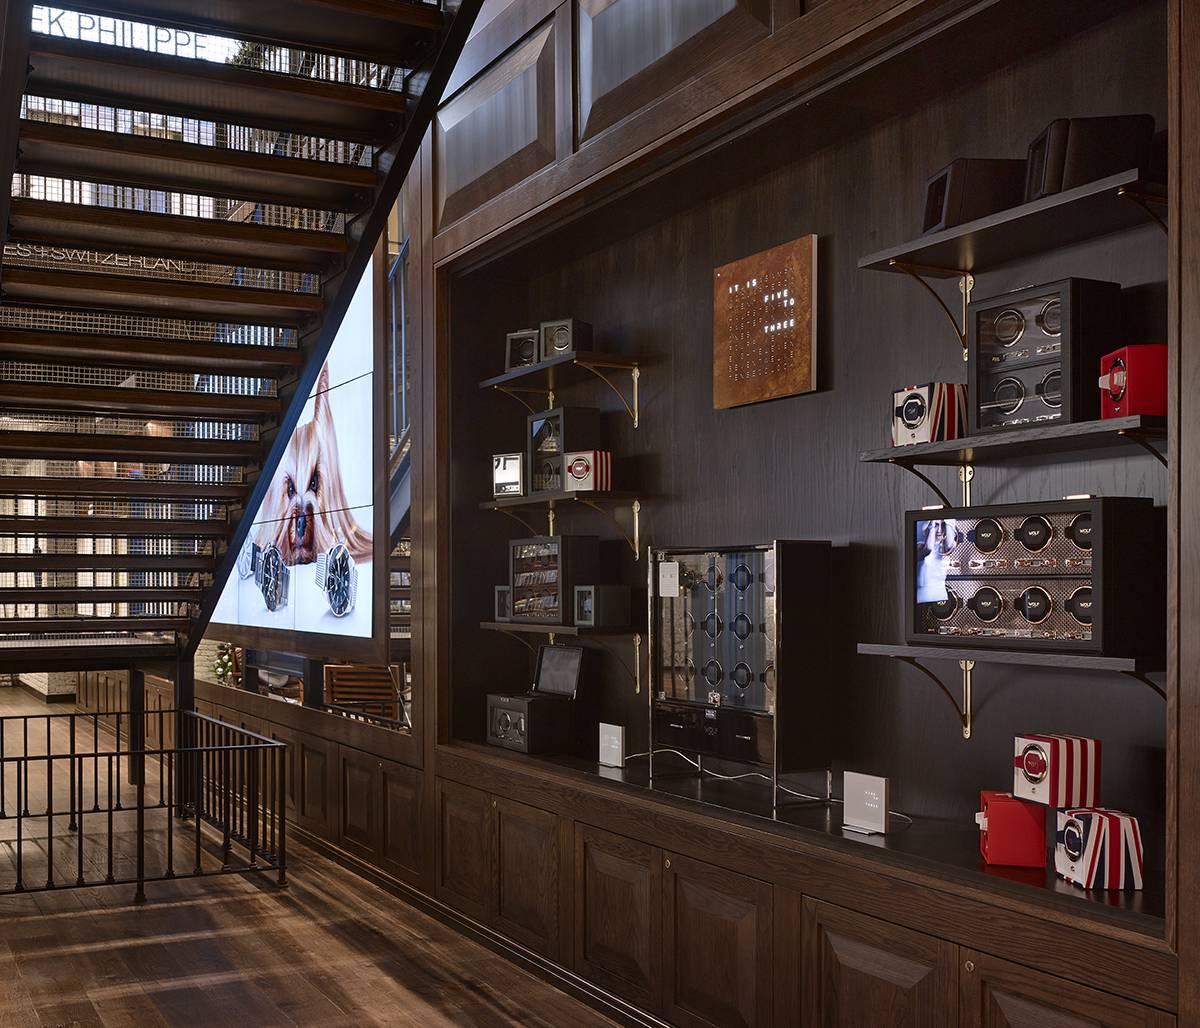 Watches of Switzerland - WOS Greene Street, Soho, NY NYC - Architect:  Neumann & Rudy